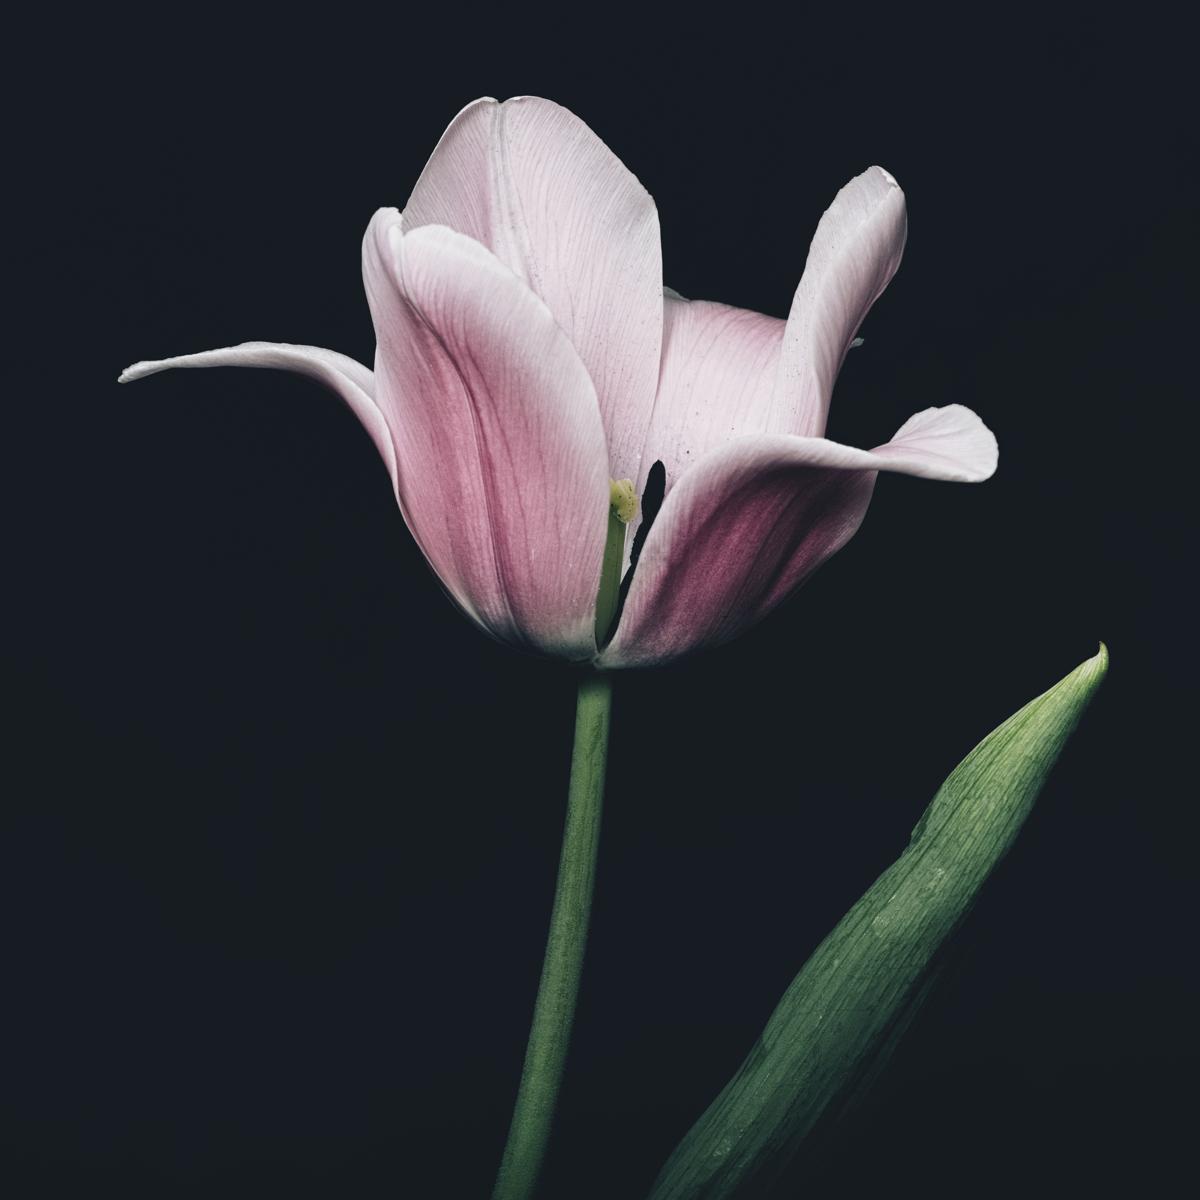 Tulip #158 (large view)